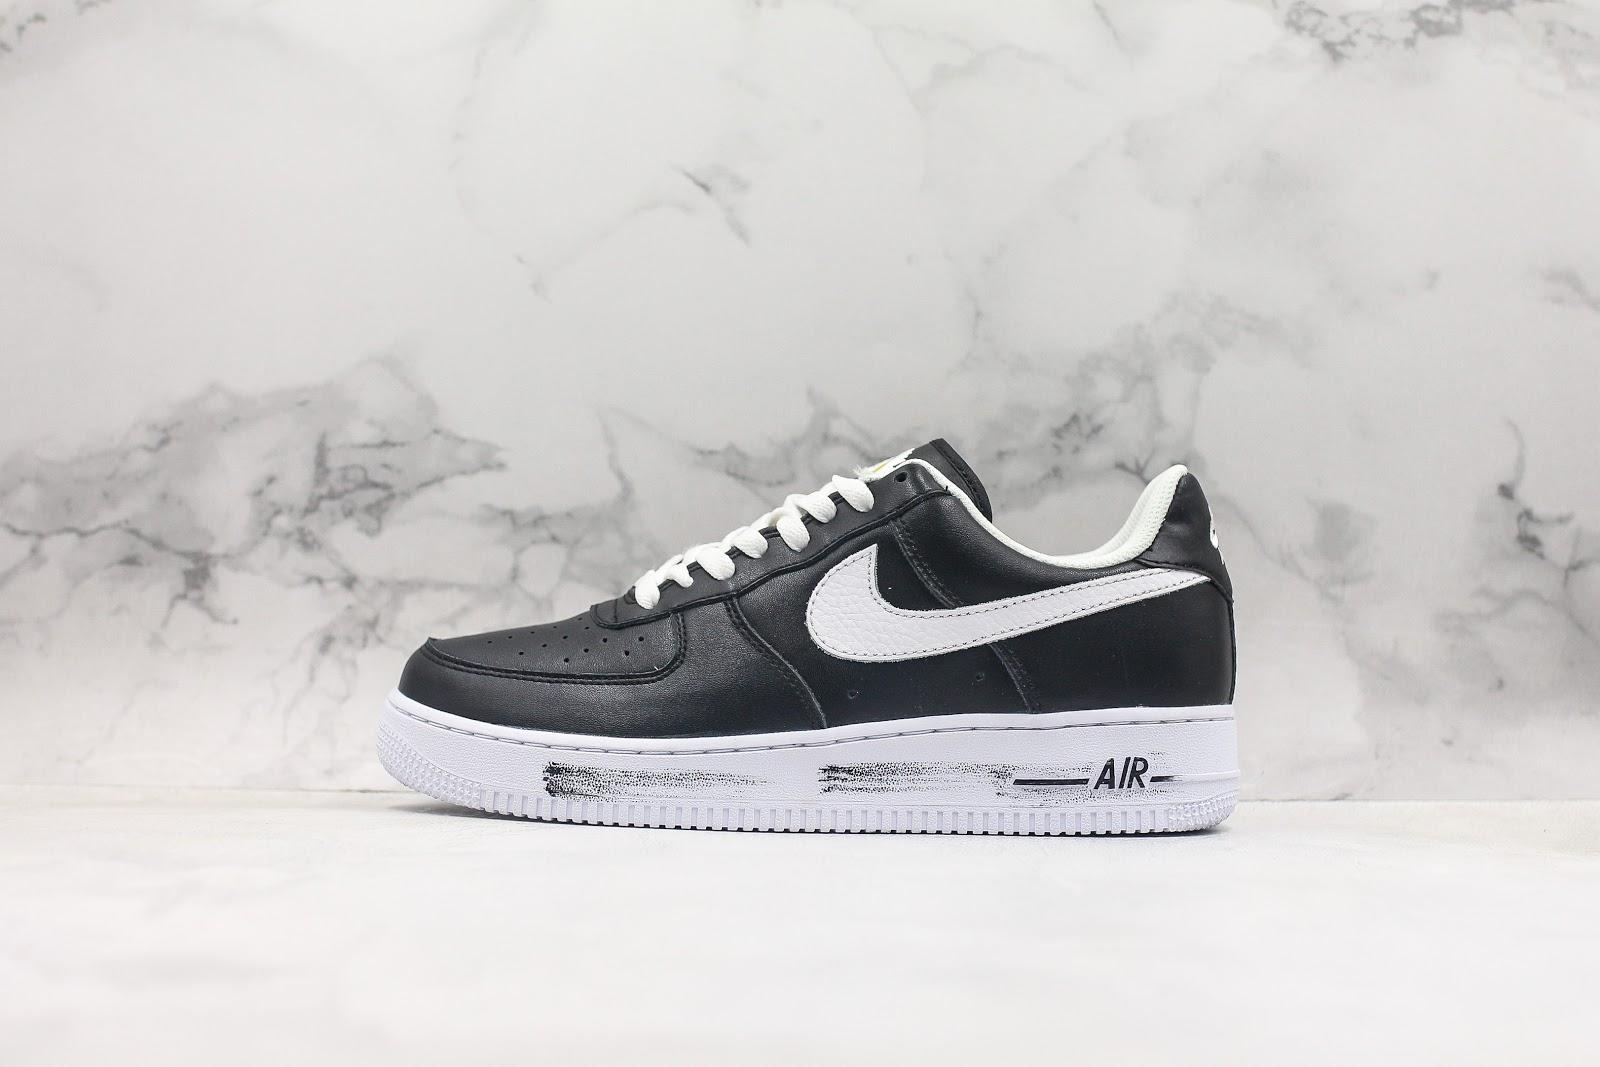 PEACEMINUSONE-x-Nike-Air-Force-1-Black-White-For-Sale